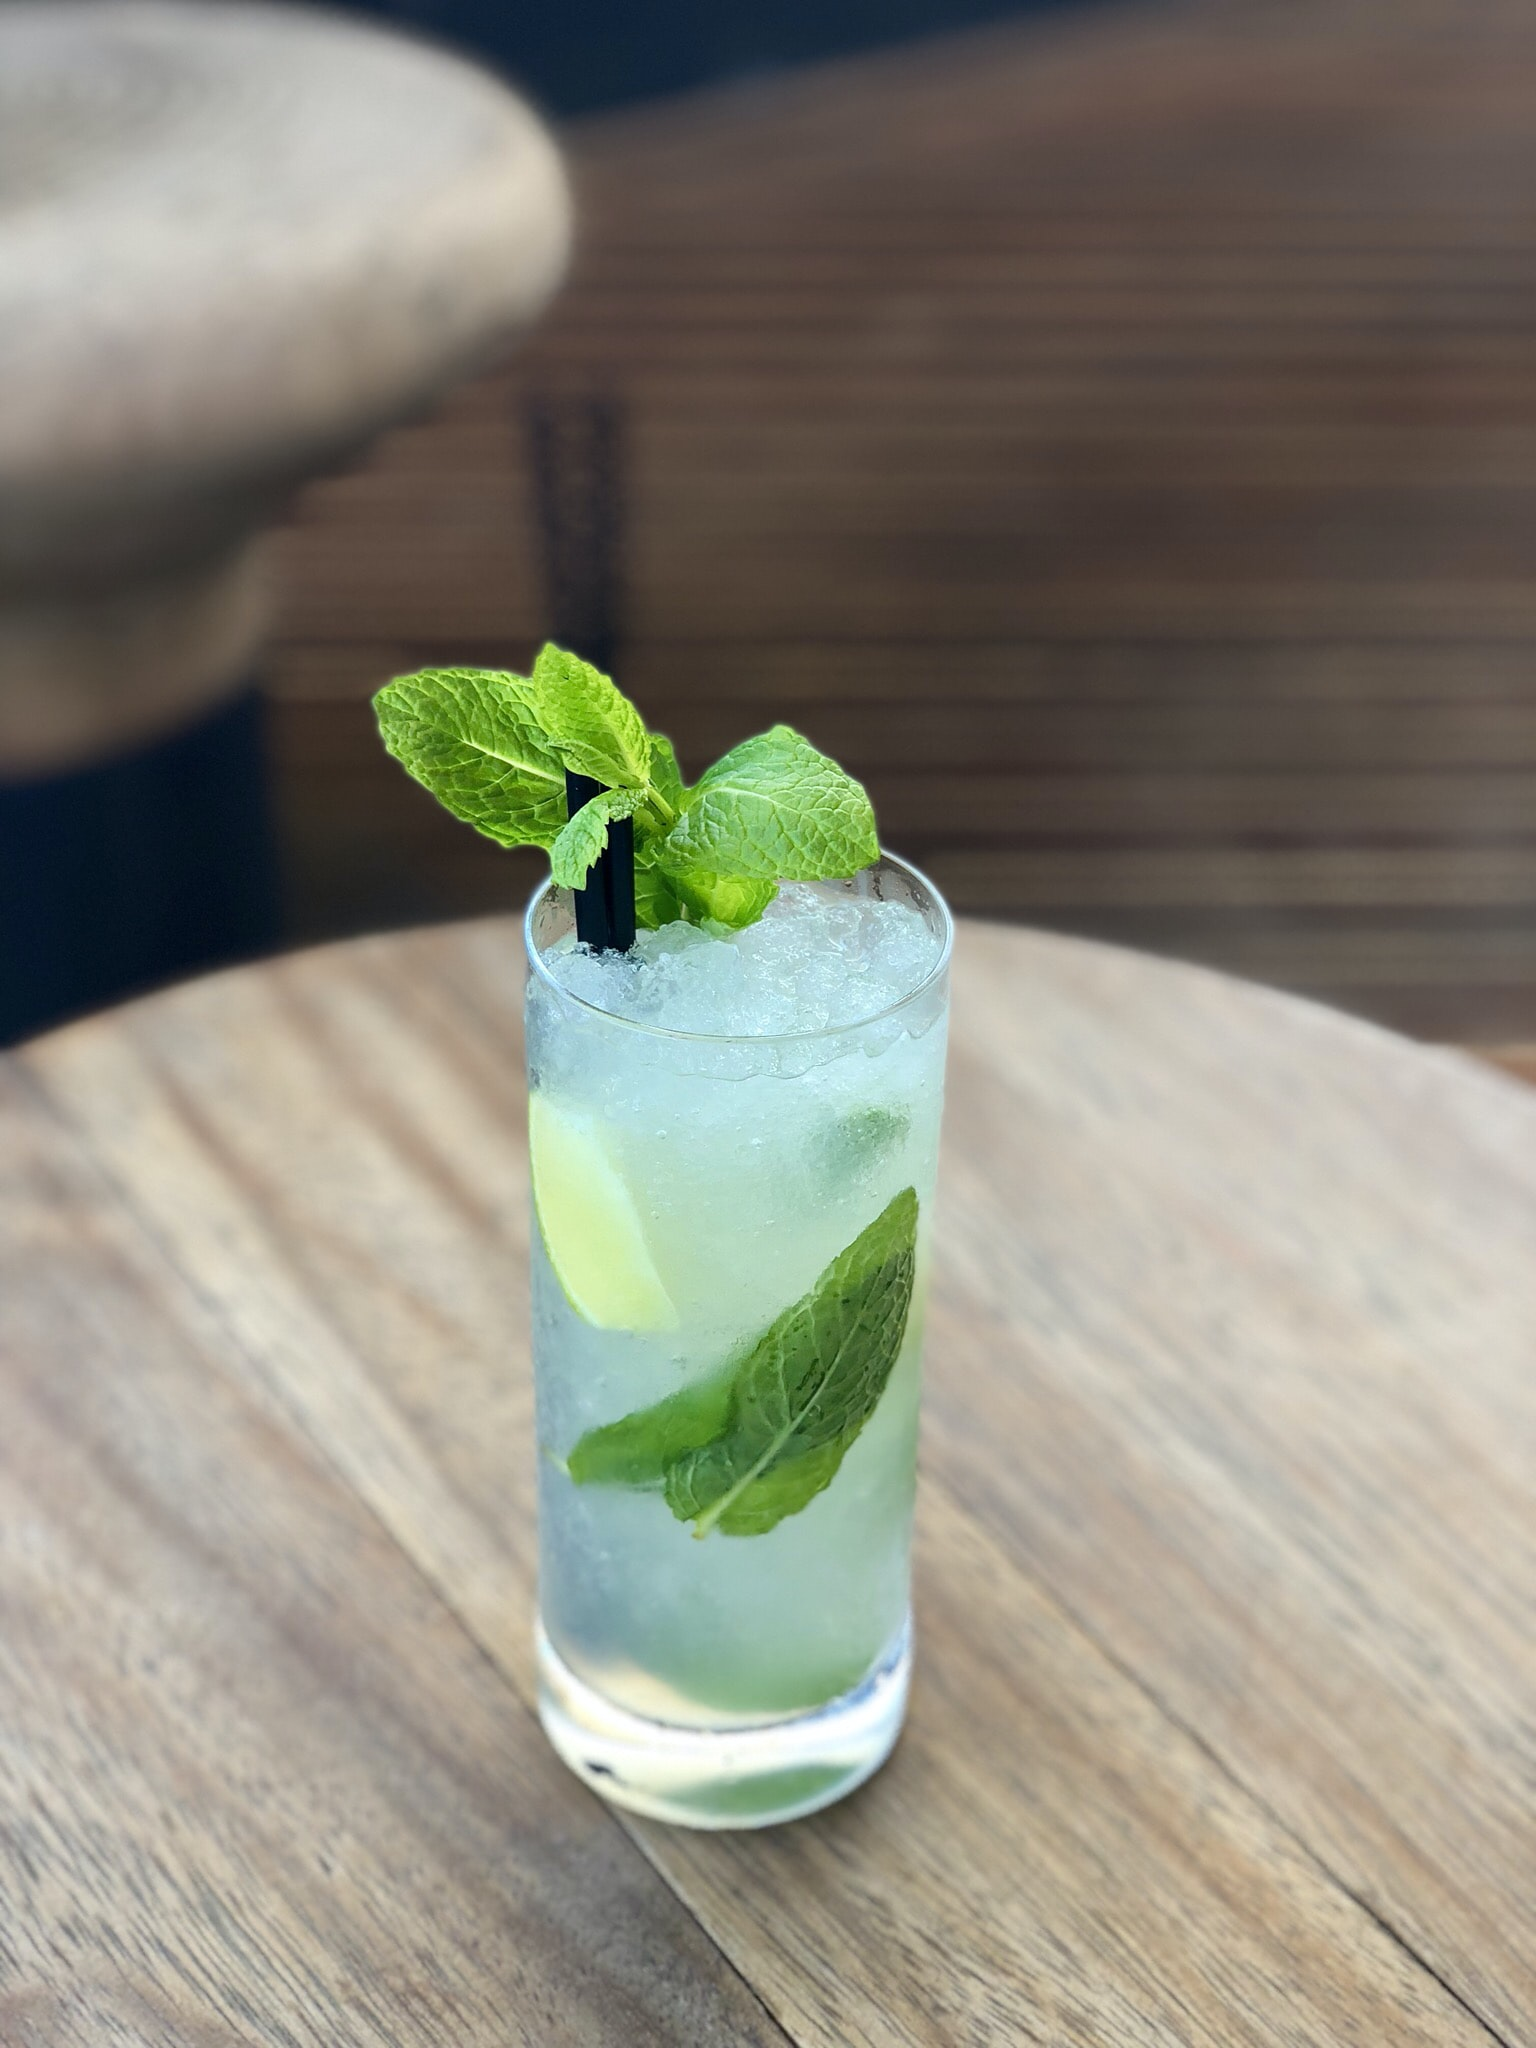 mint juice in clear drinking glass